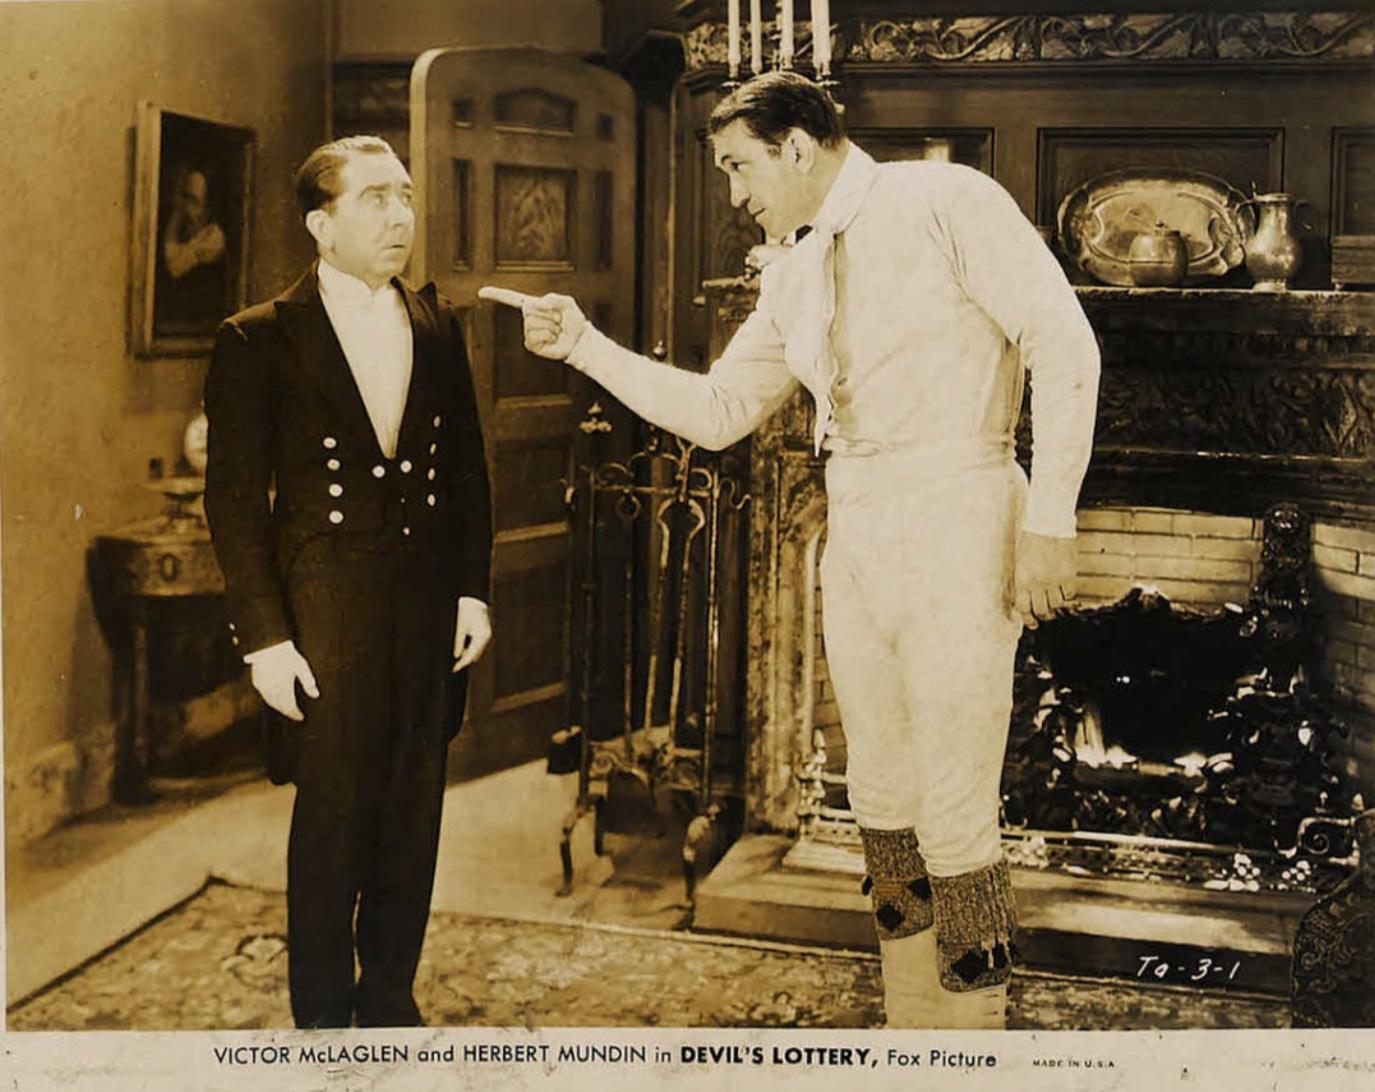 Victor McLaglen and Herbert Mundin in Devil's Lottery (1932)